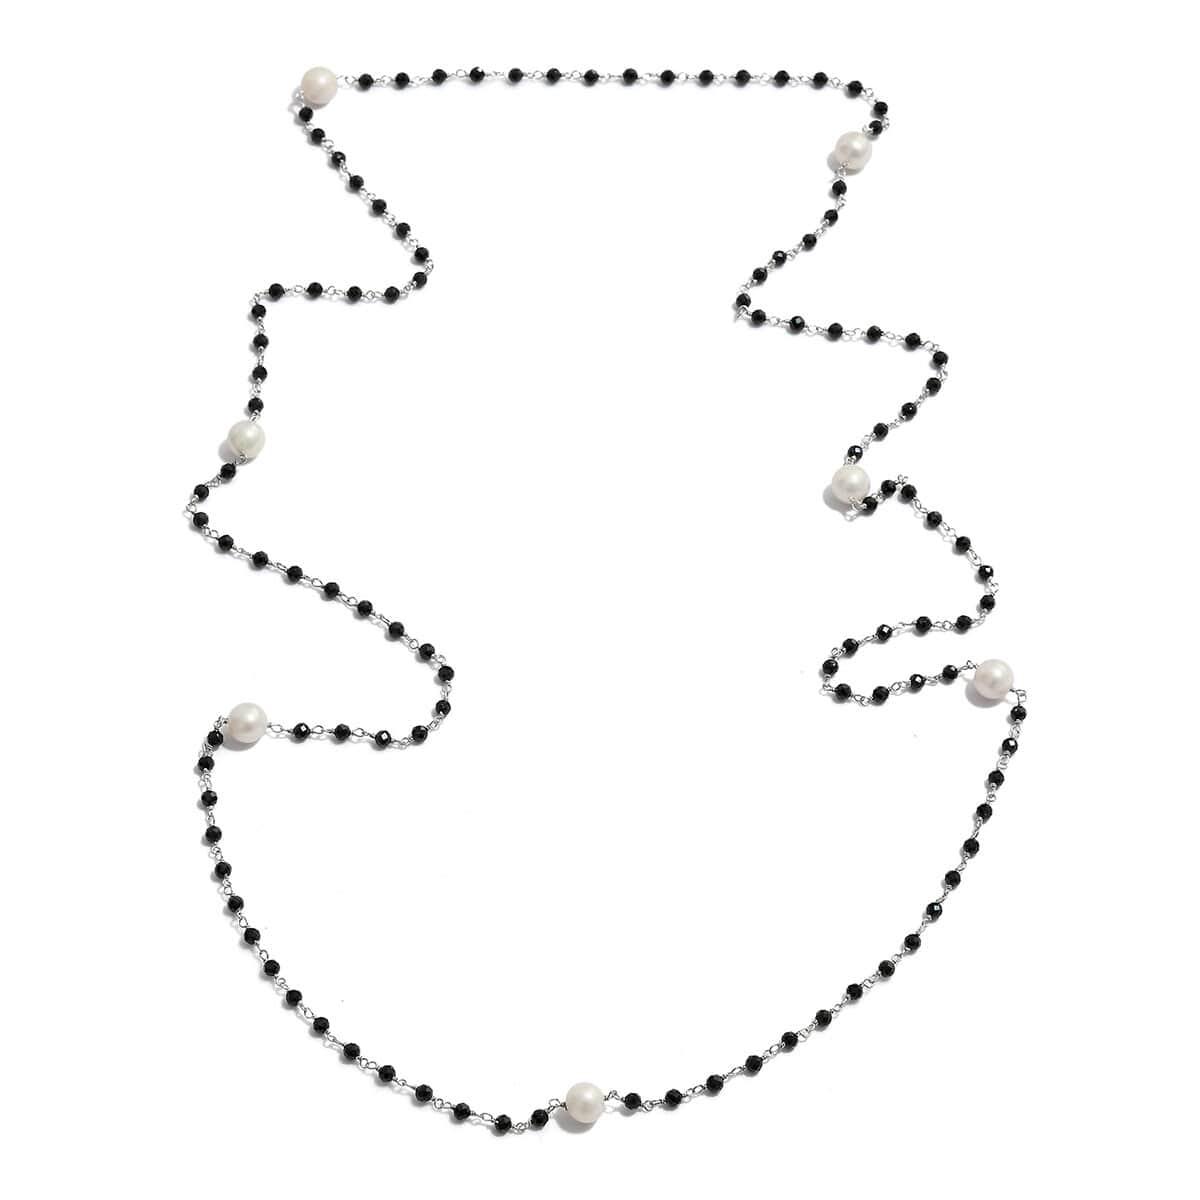 1a211d83d61af Freshwater Pearl, Thai Black Spinel Station Necklace (36 in) in Platinum  Over Sterling Silver 20.00 ctw